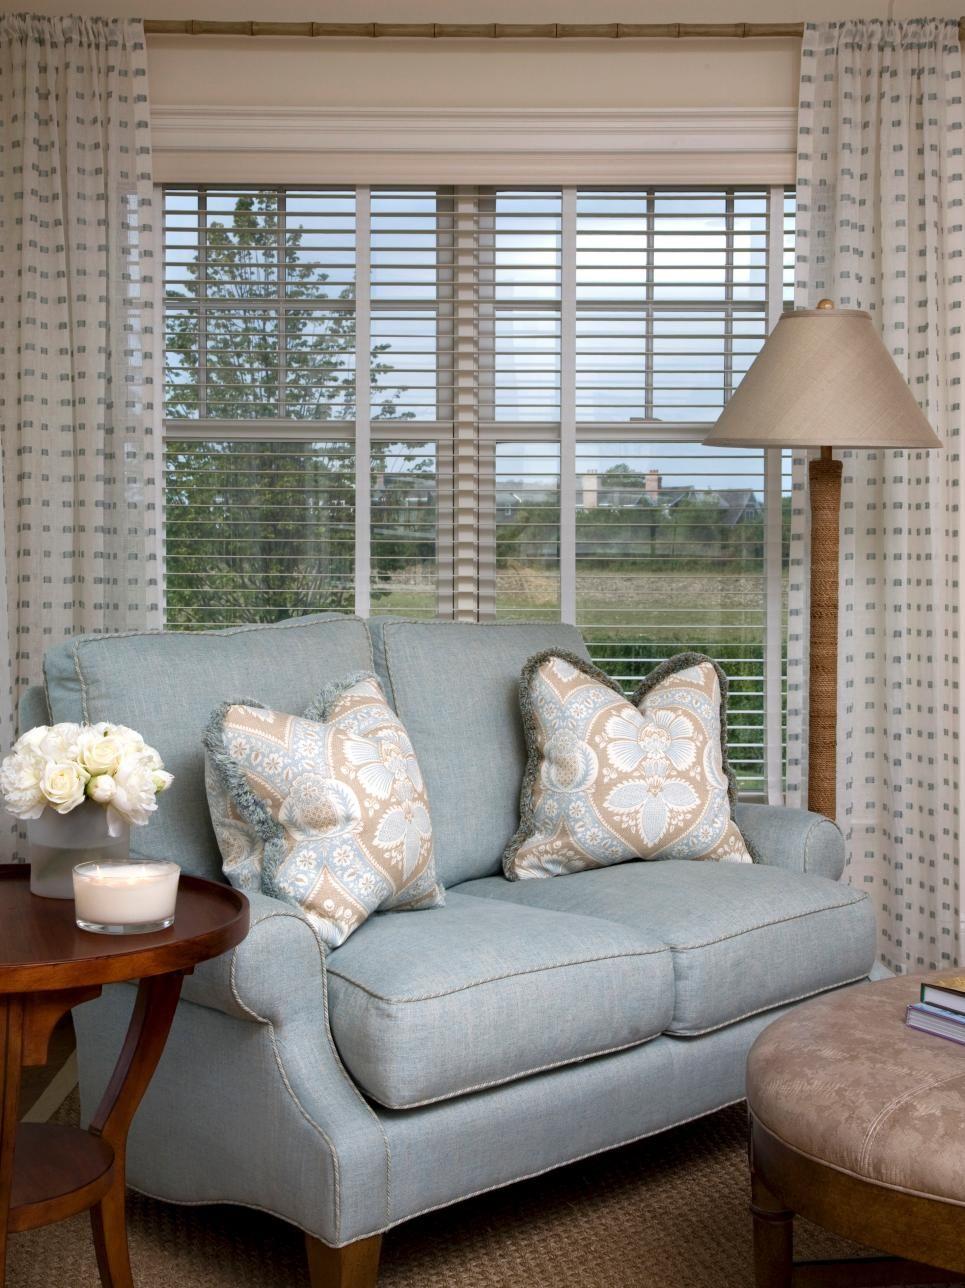 Window treatment ideas for a sunroom   stylish window treatments  nooks the facts and window